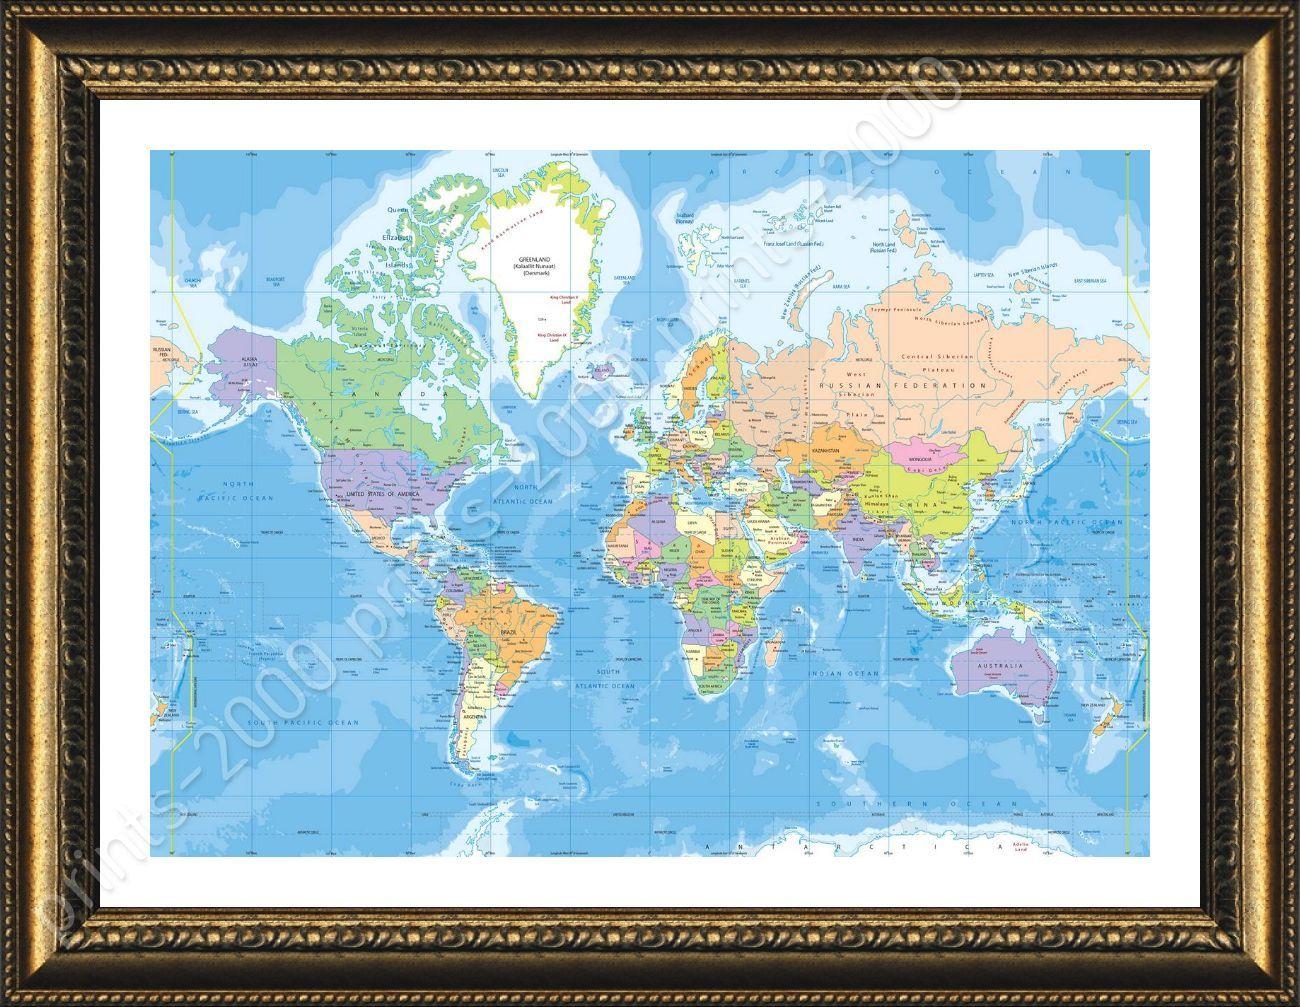 Political Modern by World Map | Framed canvas | Print Artwork For ...